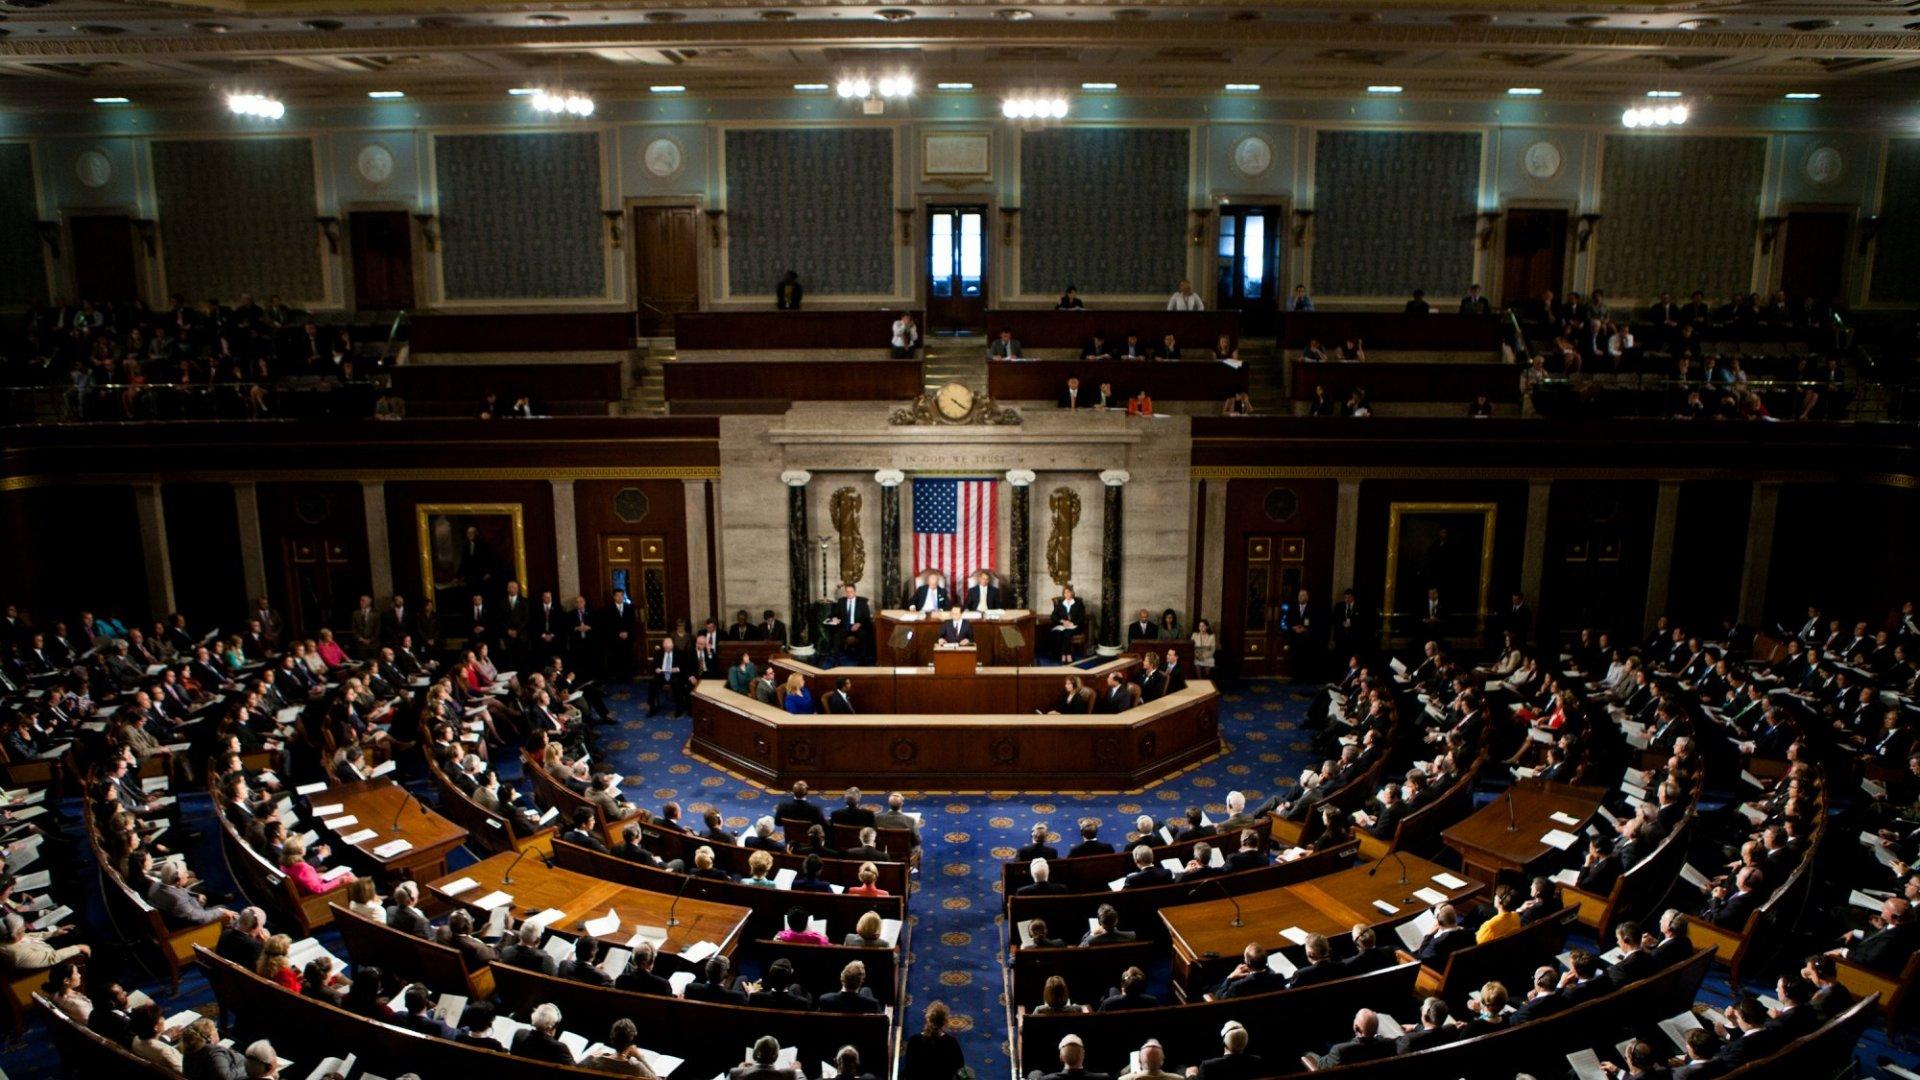 Congress Approves Keystone Pipeline Bill, Setting Up Obama Veto